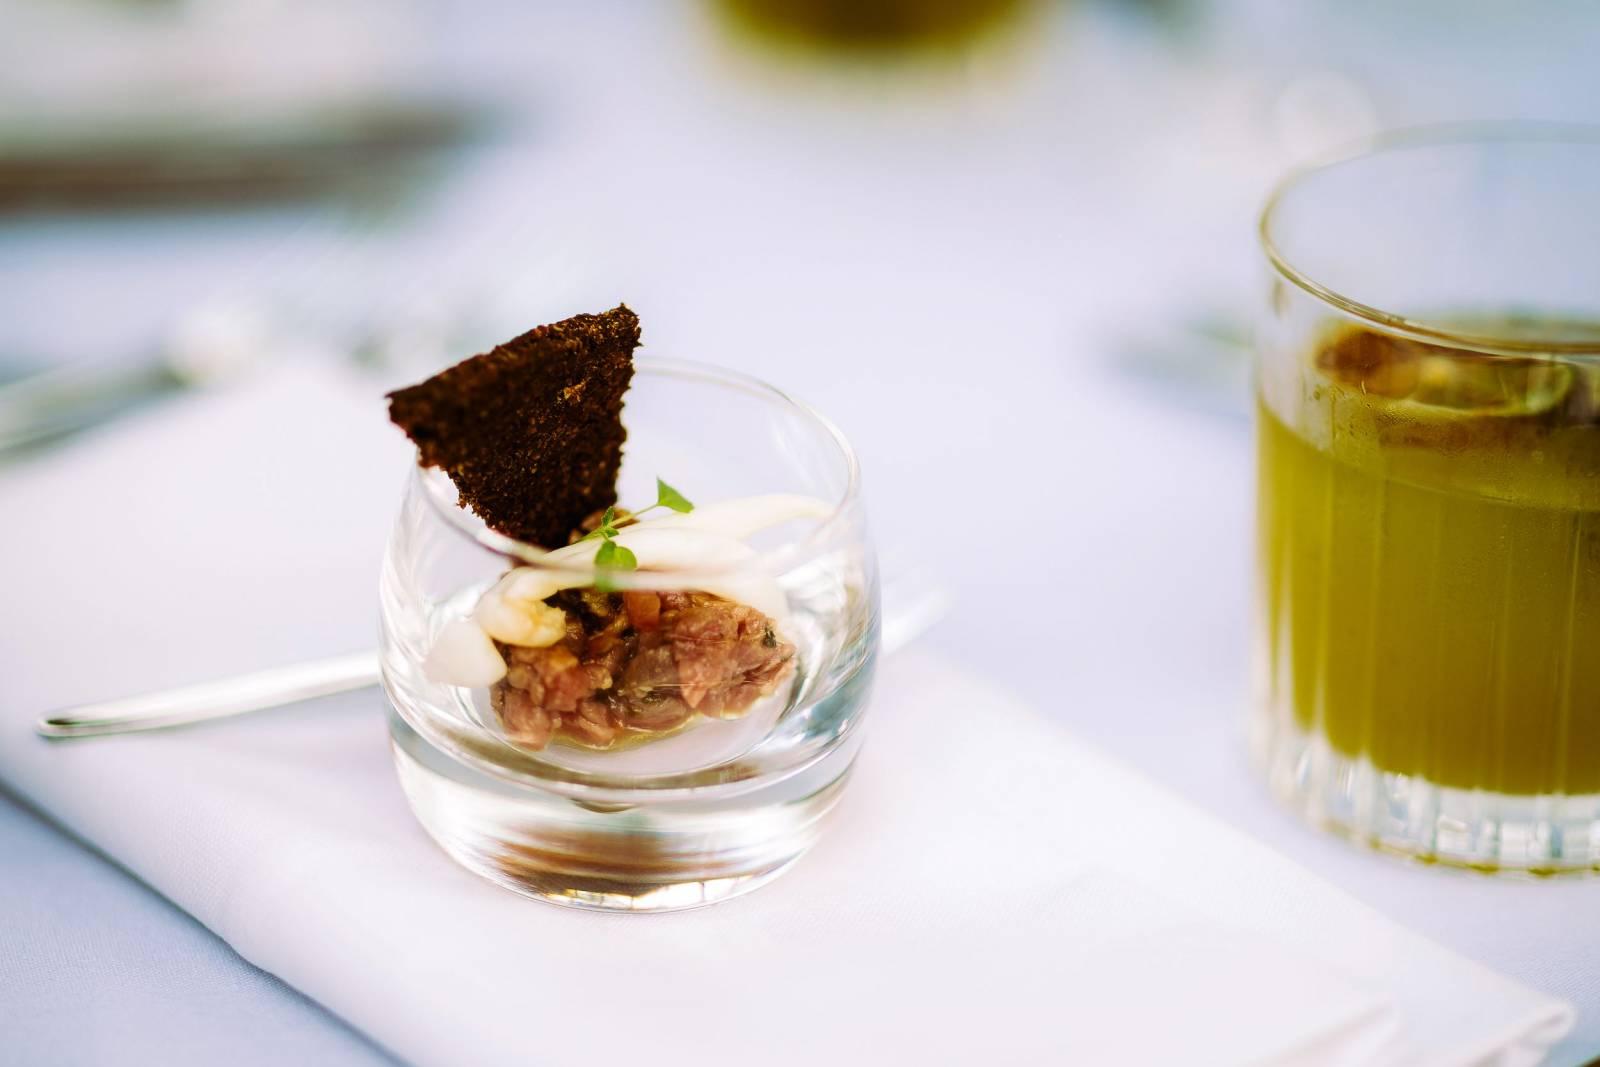 Insieme - Catering - Cateraar - Traiteur - House of Events - House of Weddings - 7